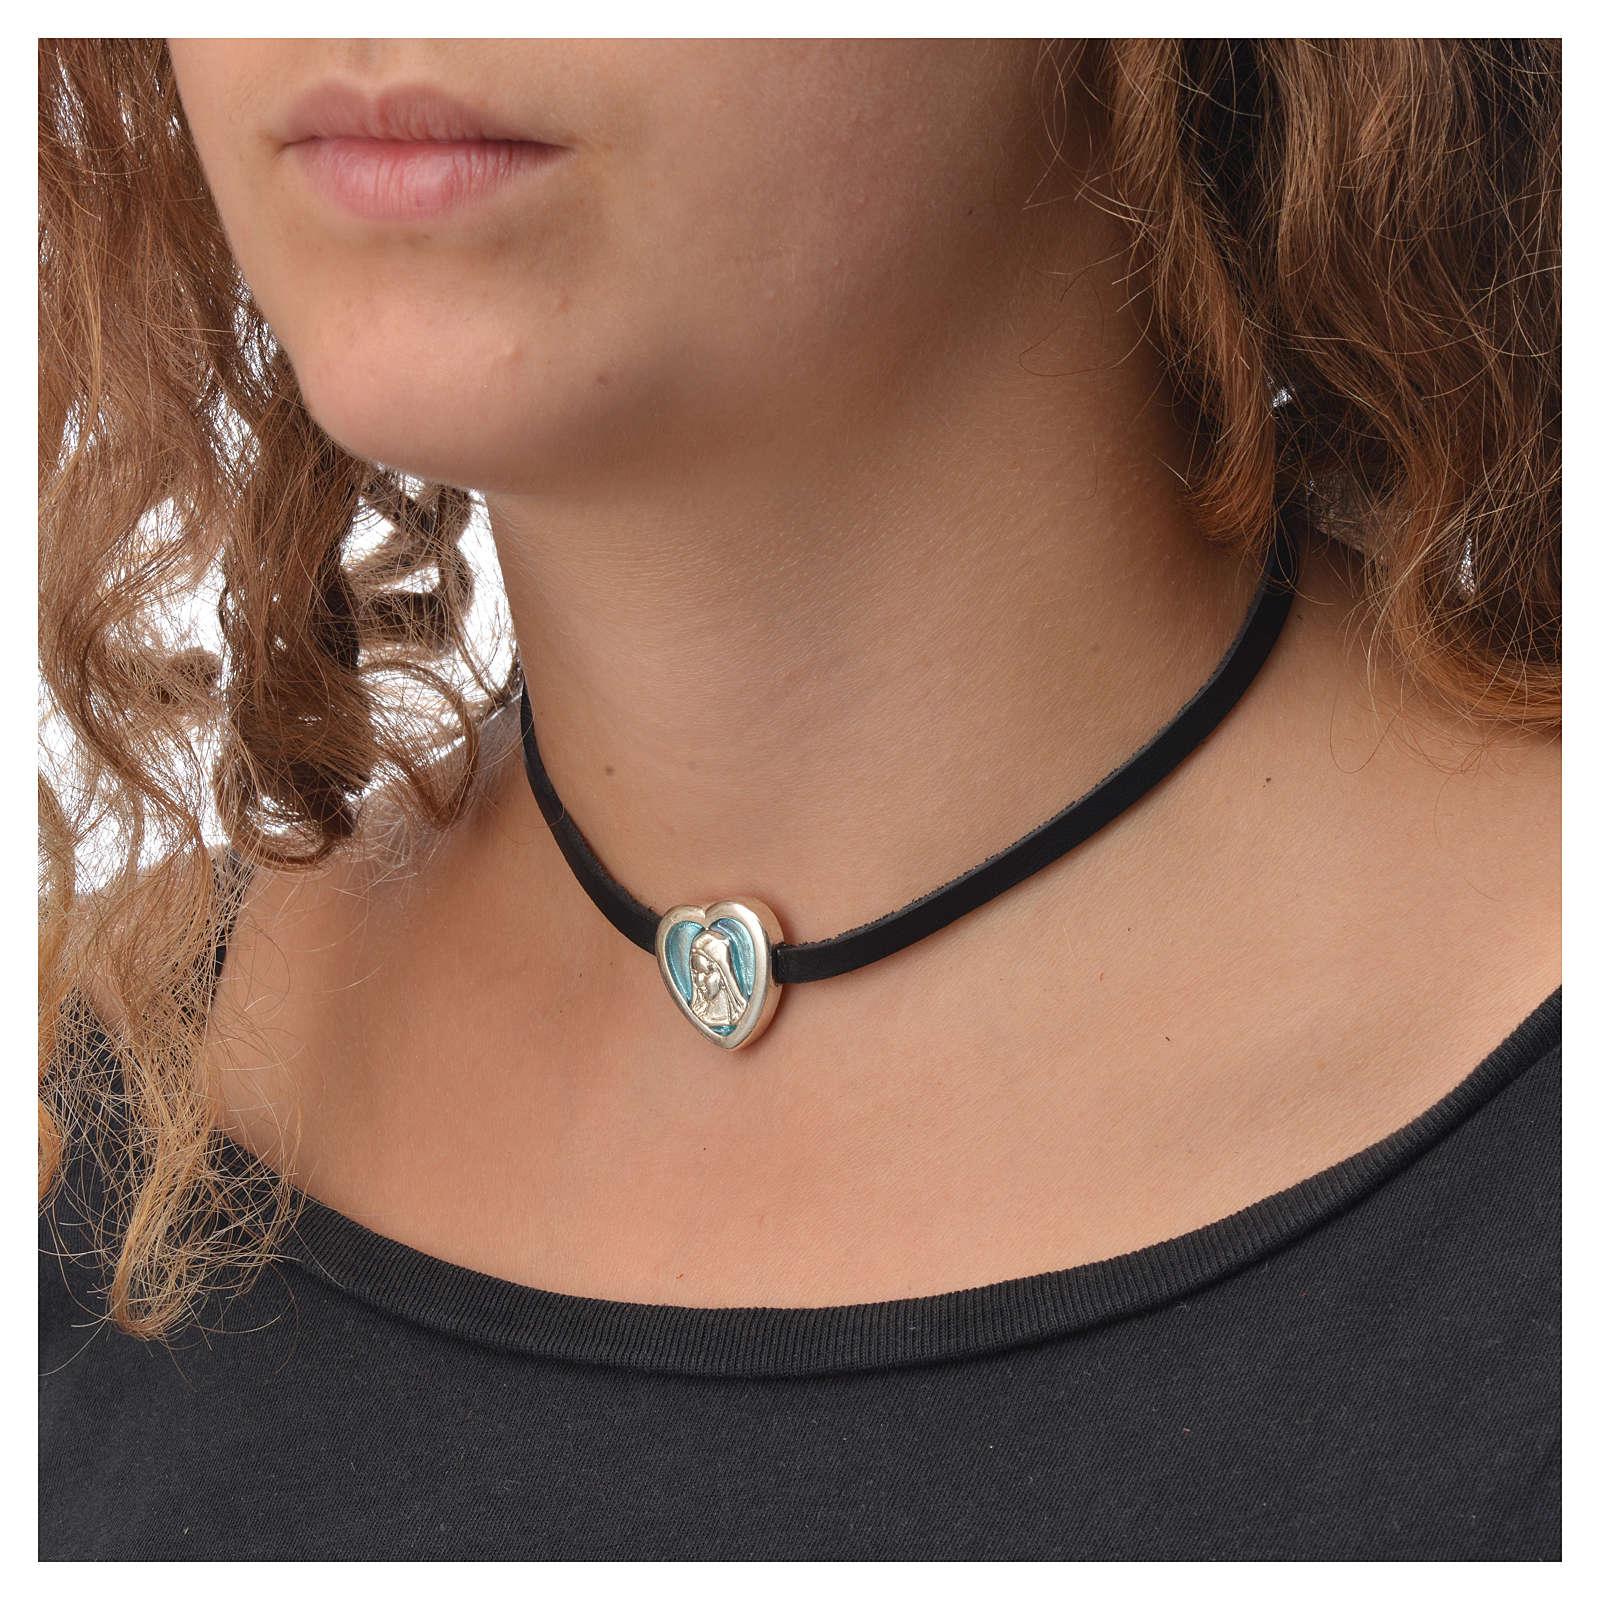 Choker necklace in black leather Virgin Mary pendant blue enamel 4